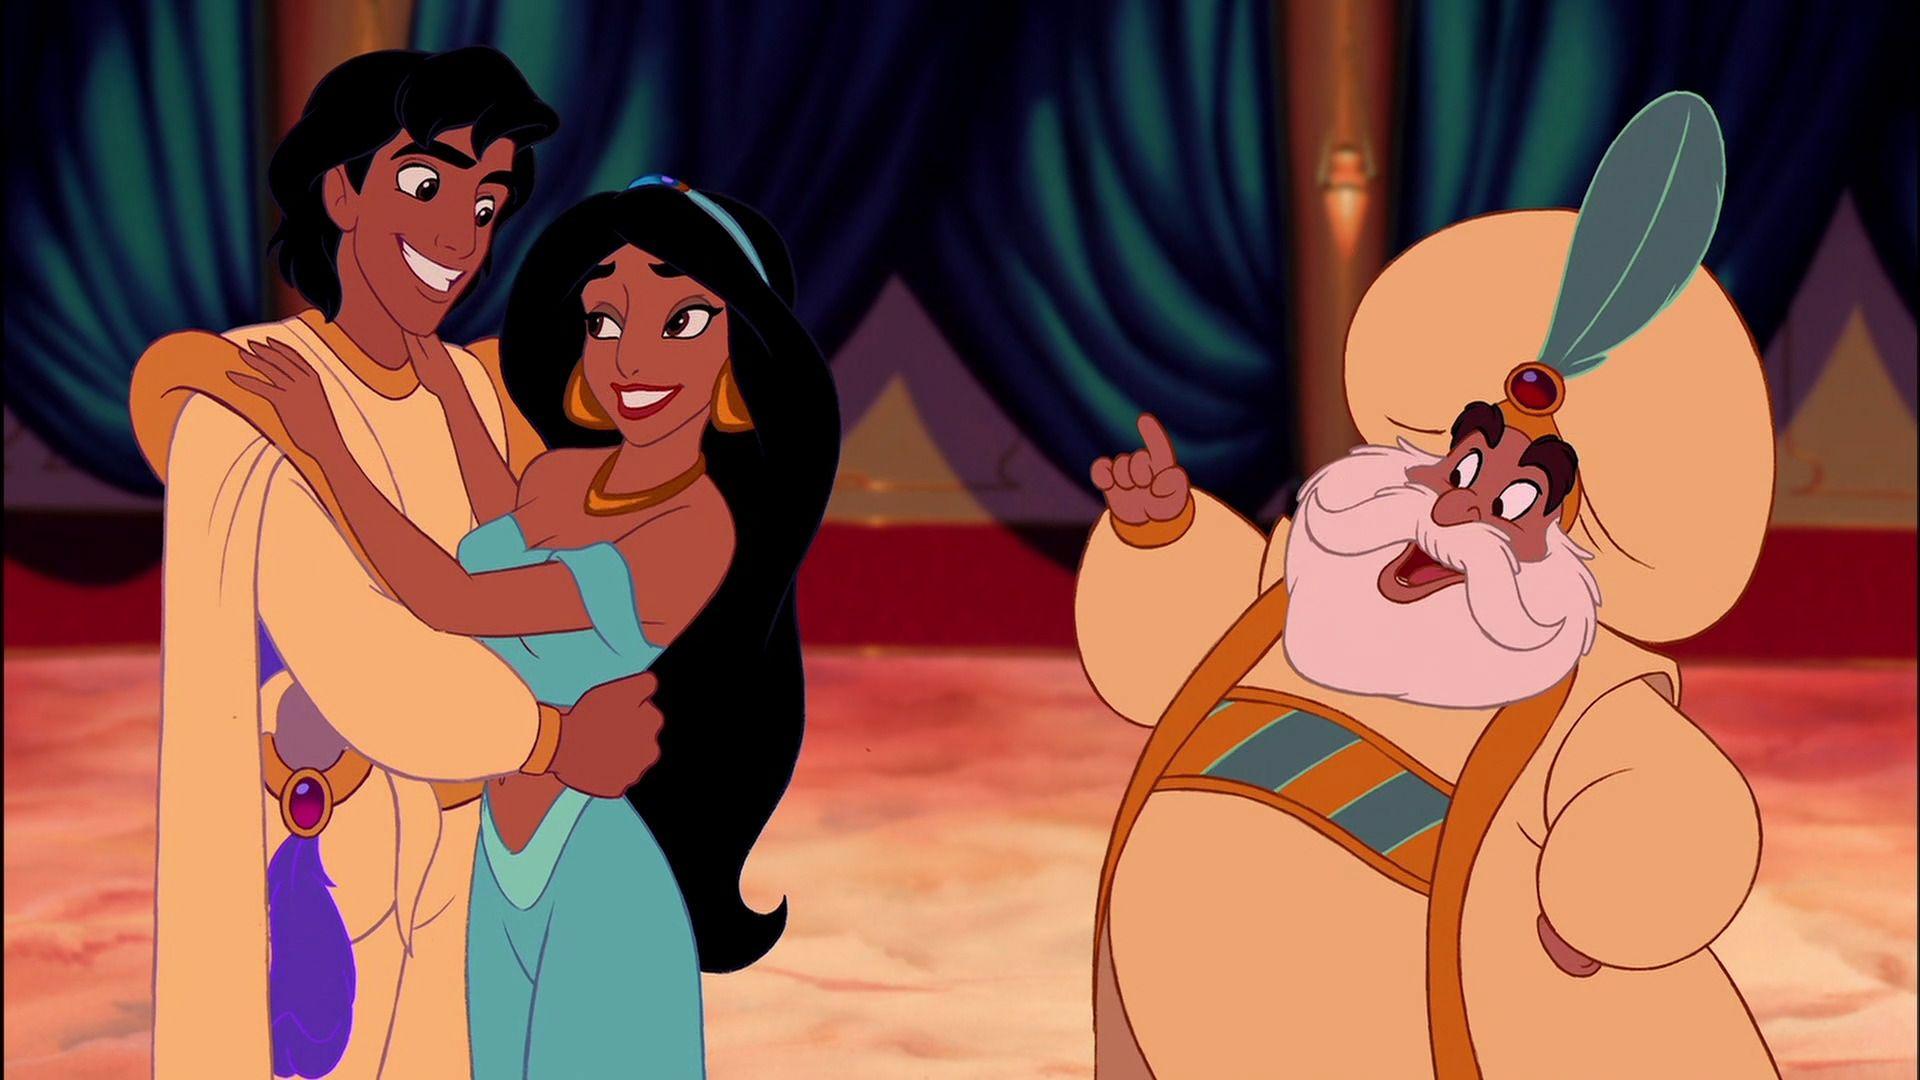 Sultan, happy about Jasmine's decision